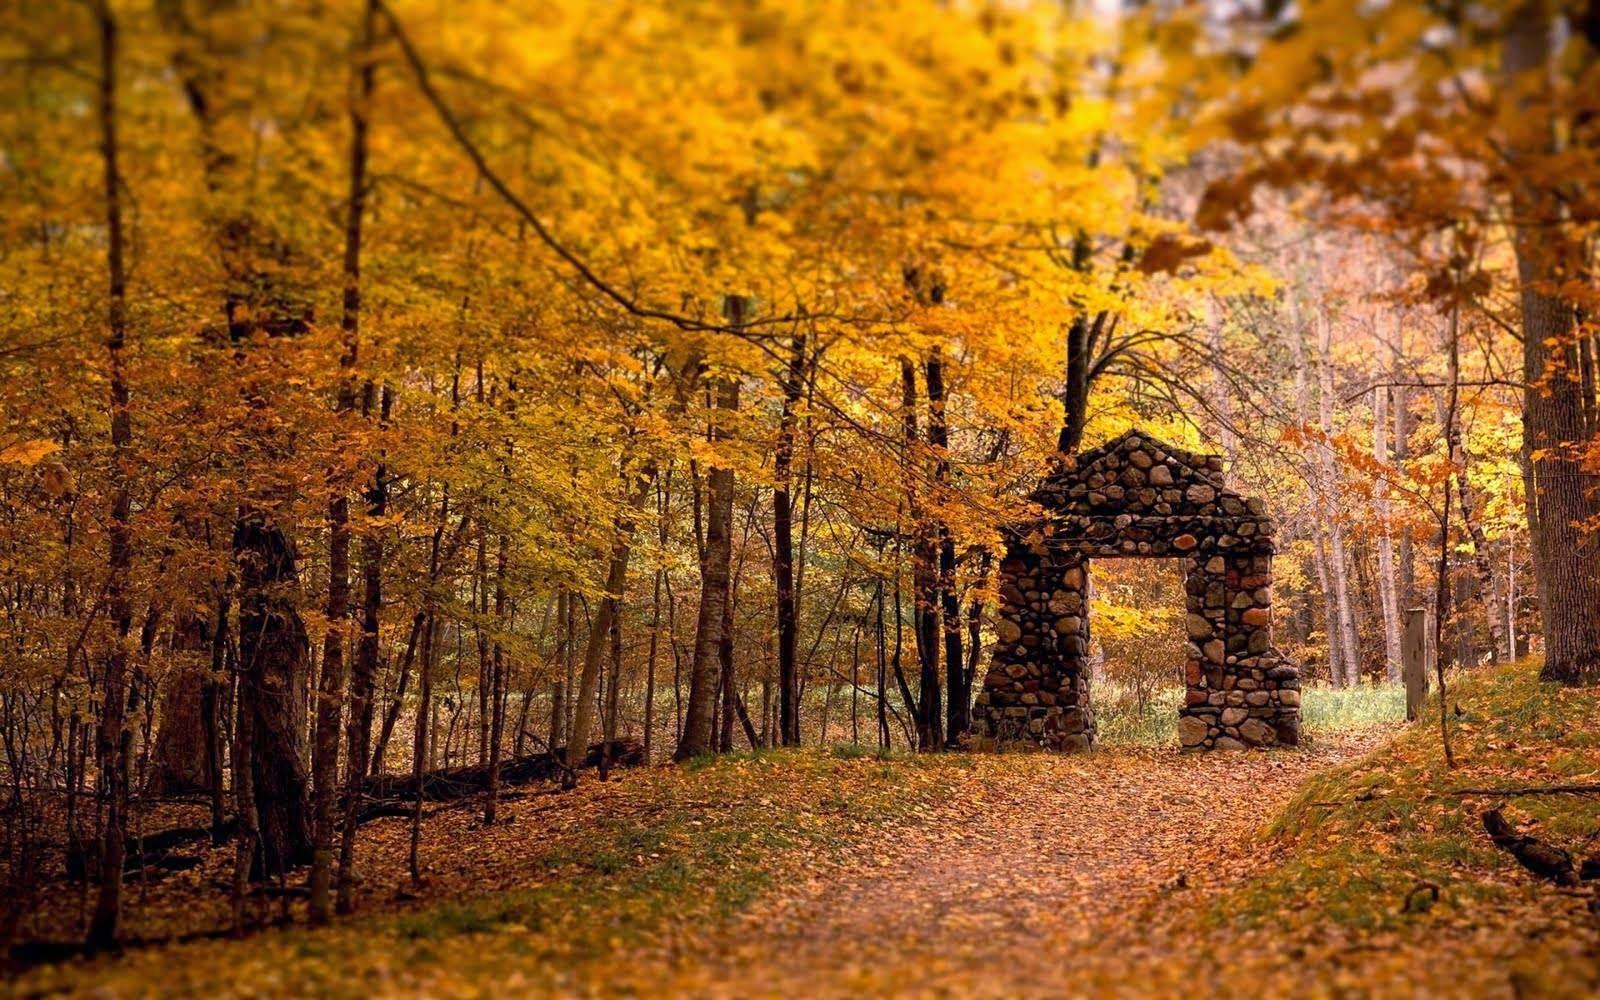 Random Facts About Autumn